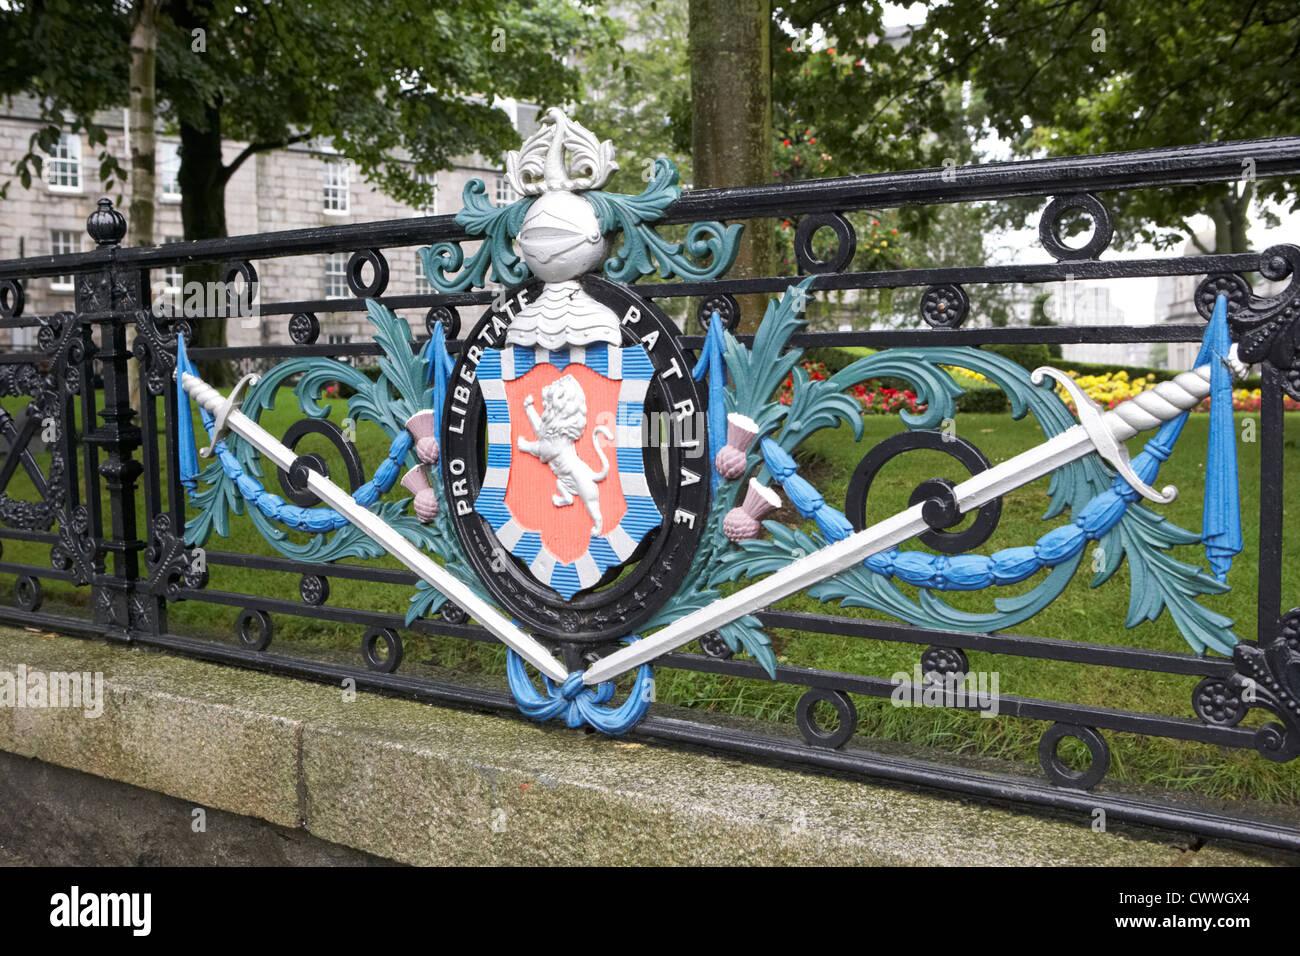 william wallace heraldic crest and claymores on rosemount viaduct garden railings aberdeen scotland uk - Stock Image